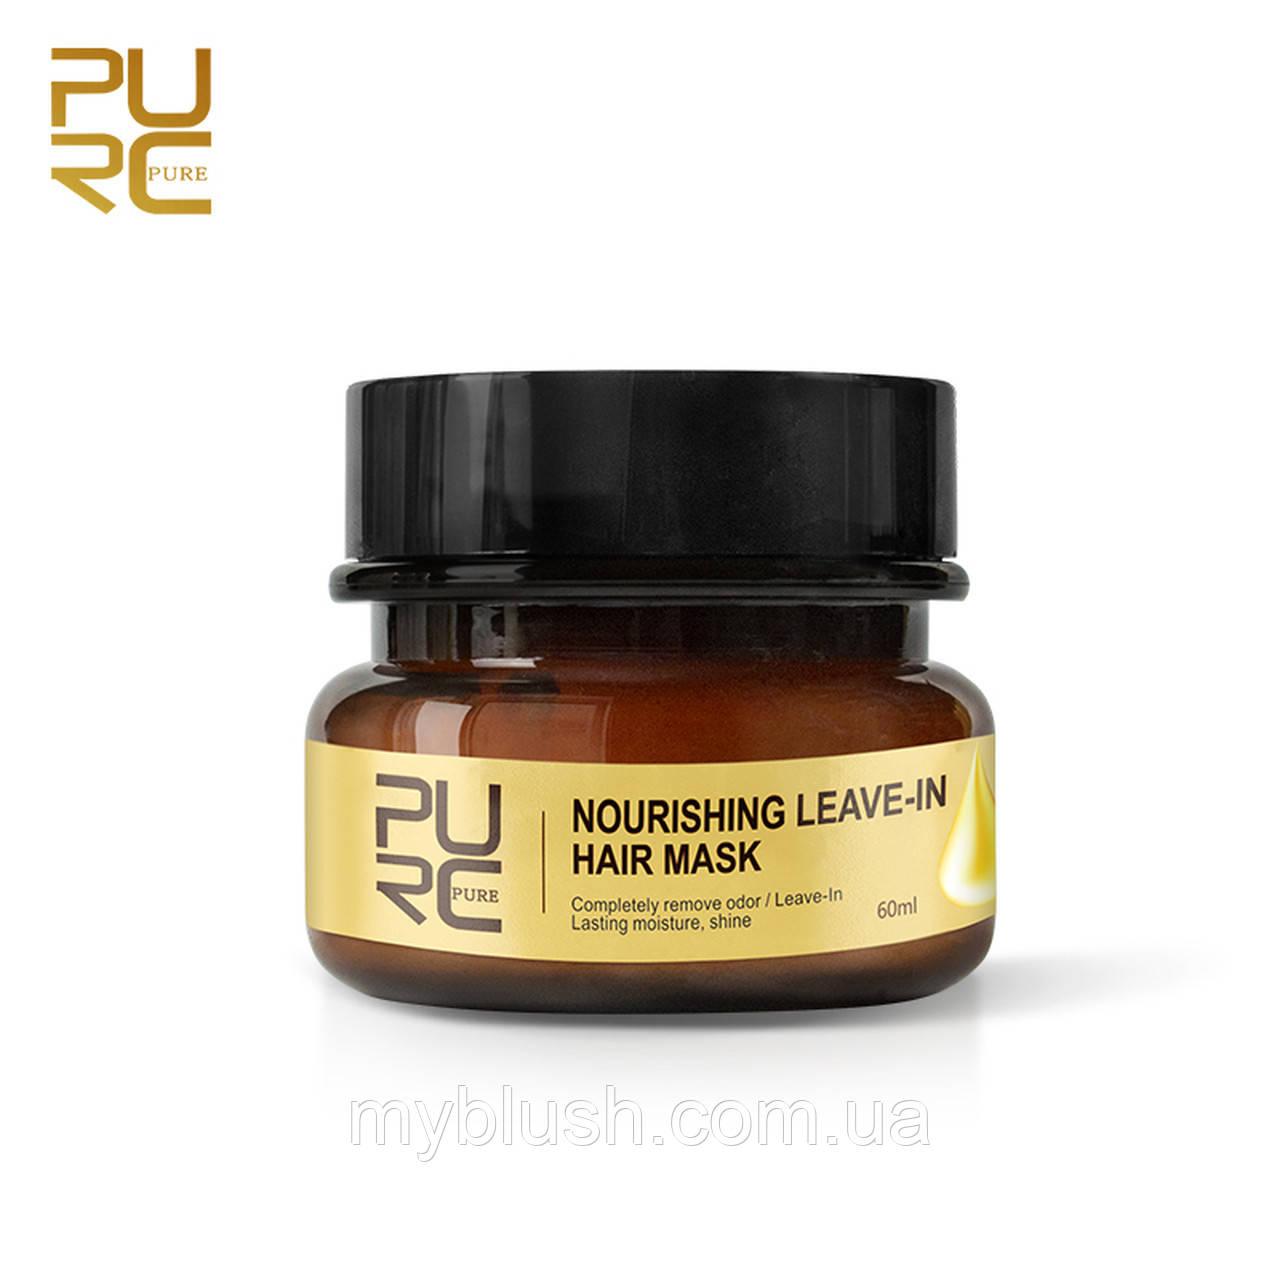 Восстанавливающая маска для волос PURC PURE Nourishing Leave-in Hair Mask 60 ml